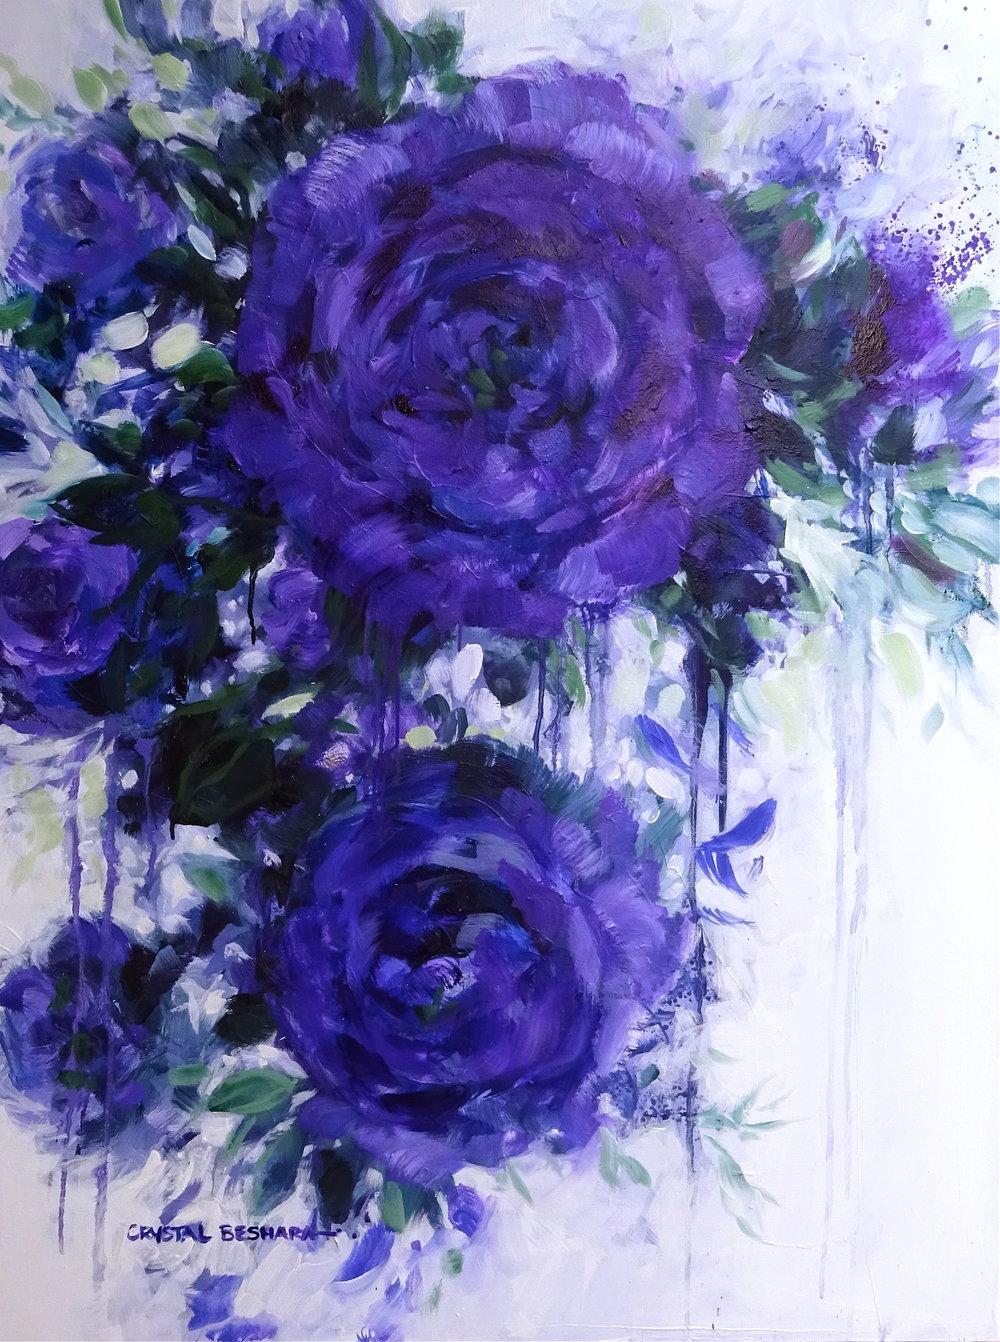 """Rosie's Blooms"" SOLD"